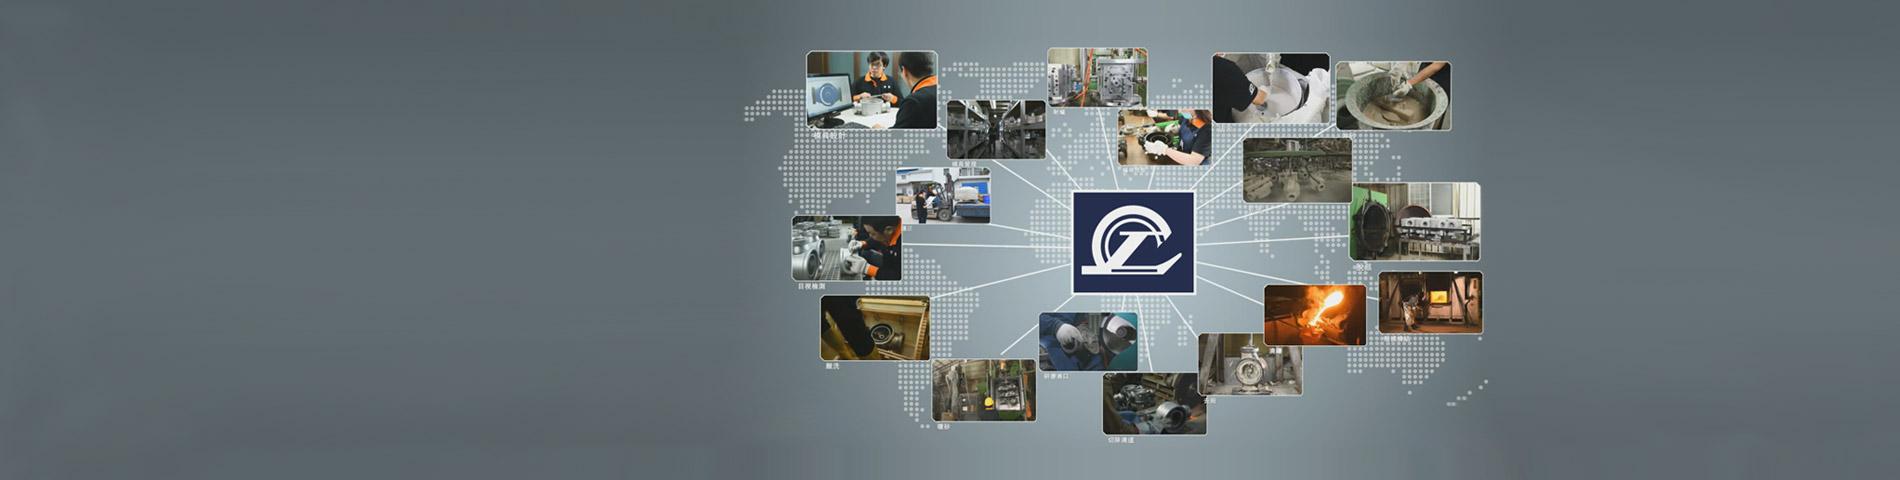 Lin Chiao   鋳造株式会社